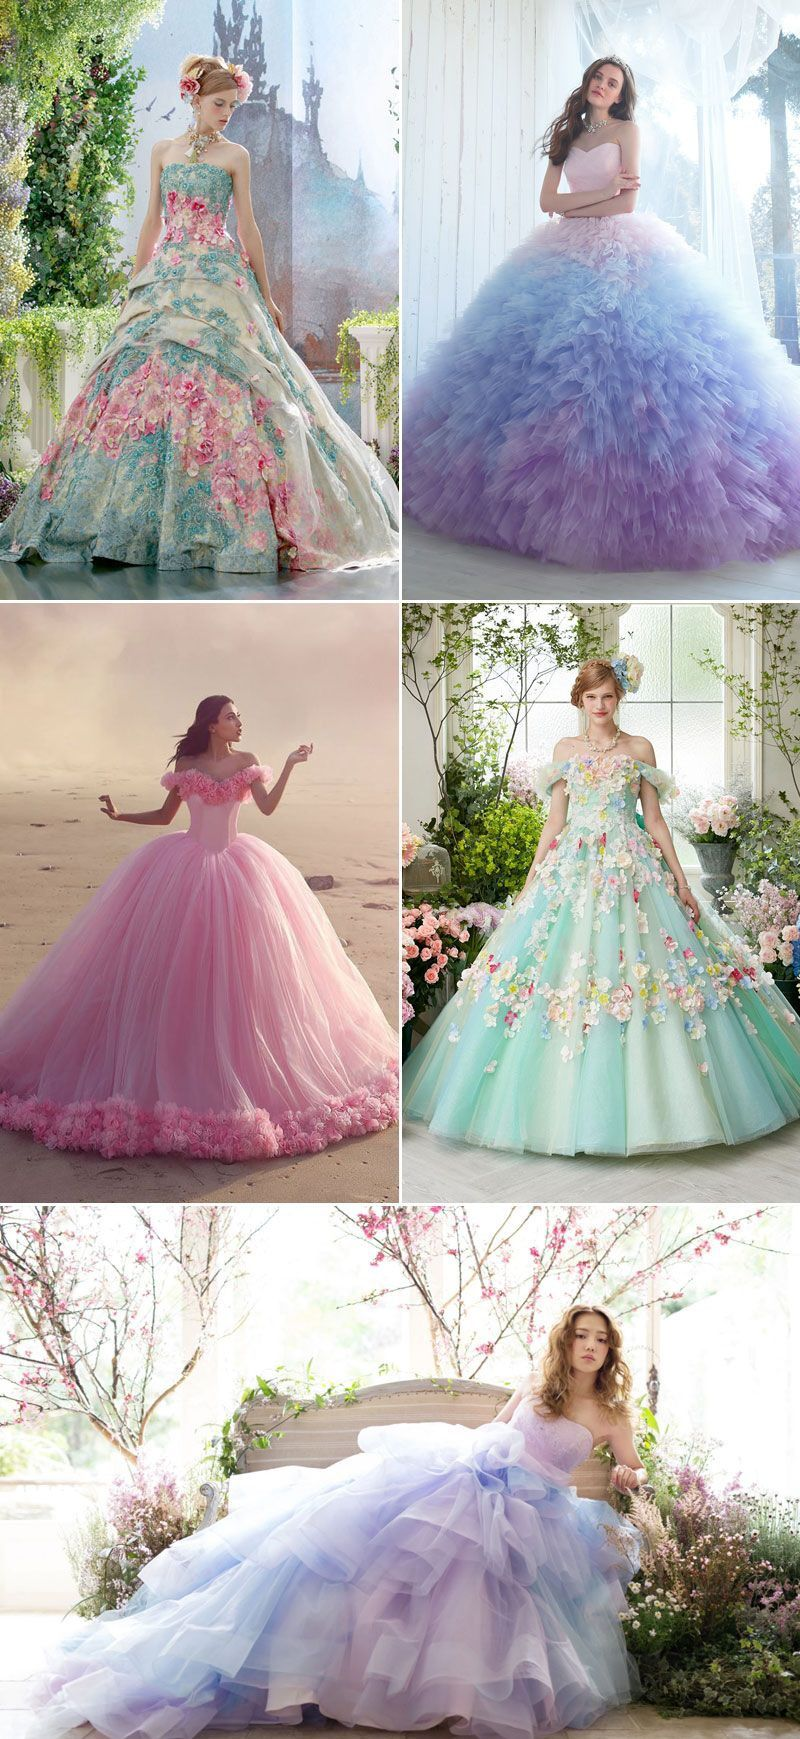 Pin von Christine Rodriguez auf romantic dresses | Pinterest ...